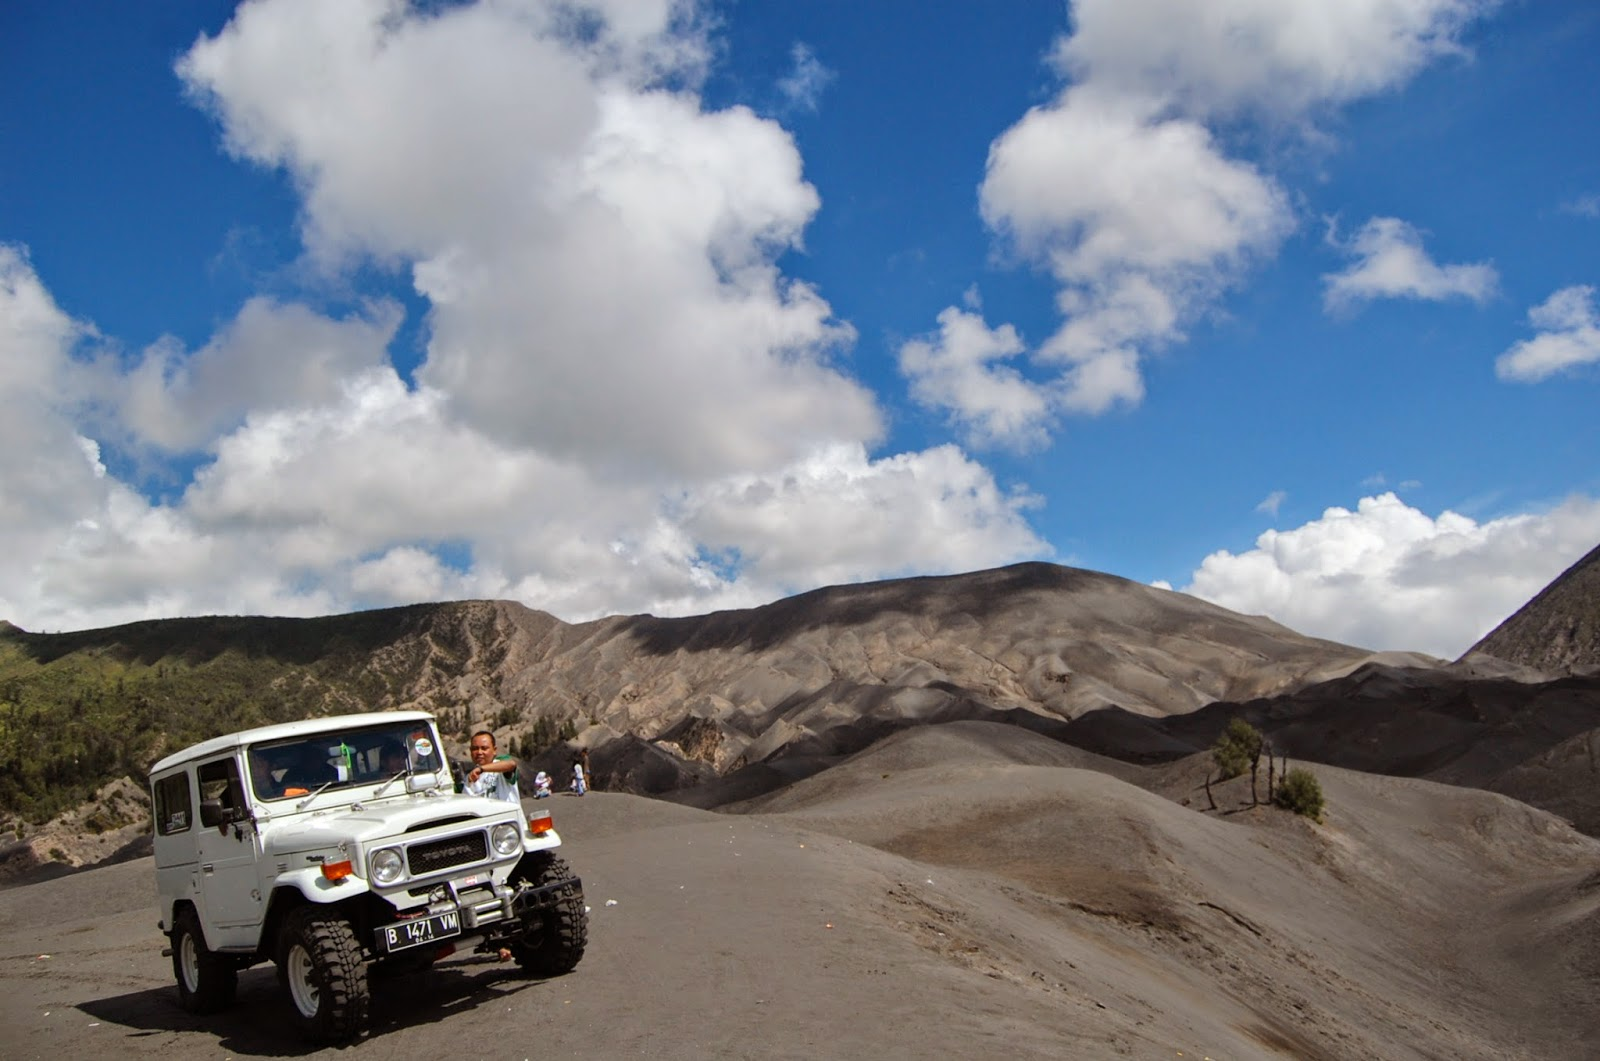 Sewa Jeep Hardtop Murah Di Bromo